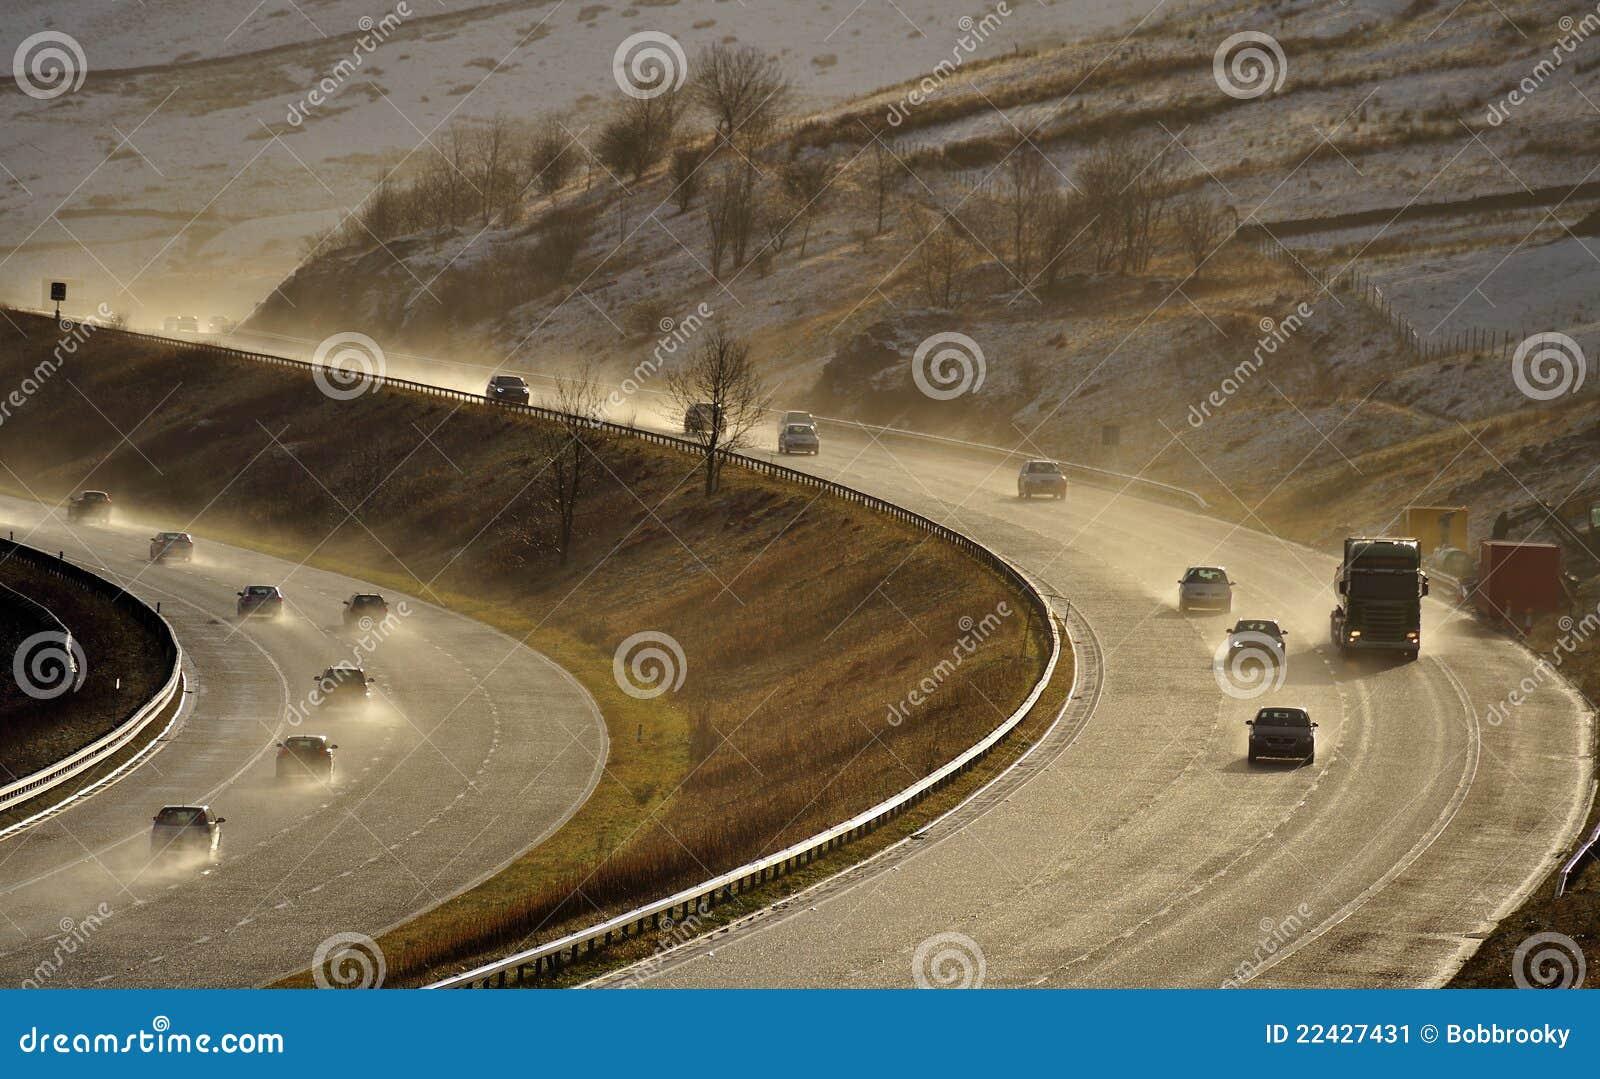 Cumbria m6 autostrady kiść uk